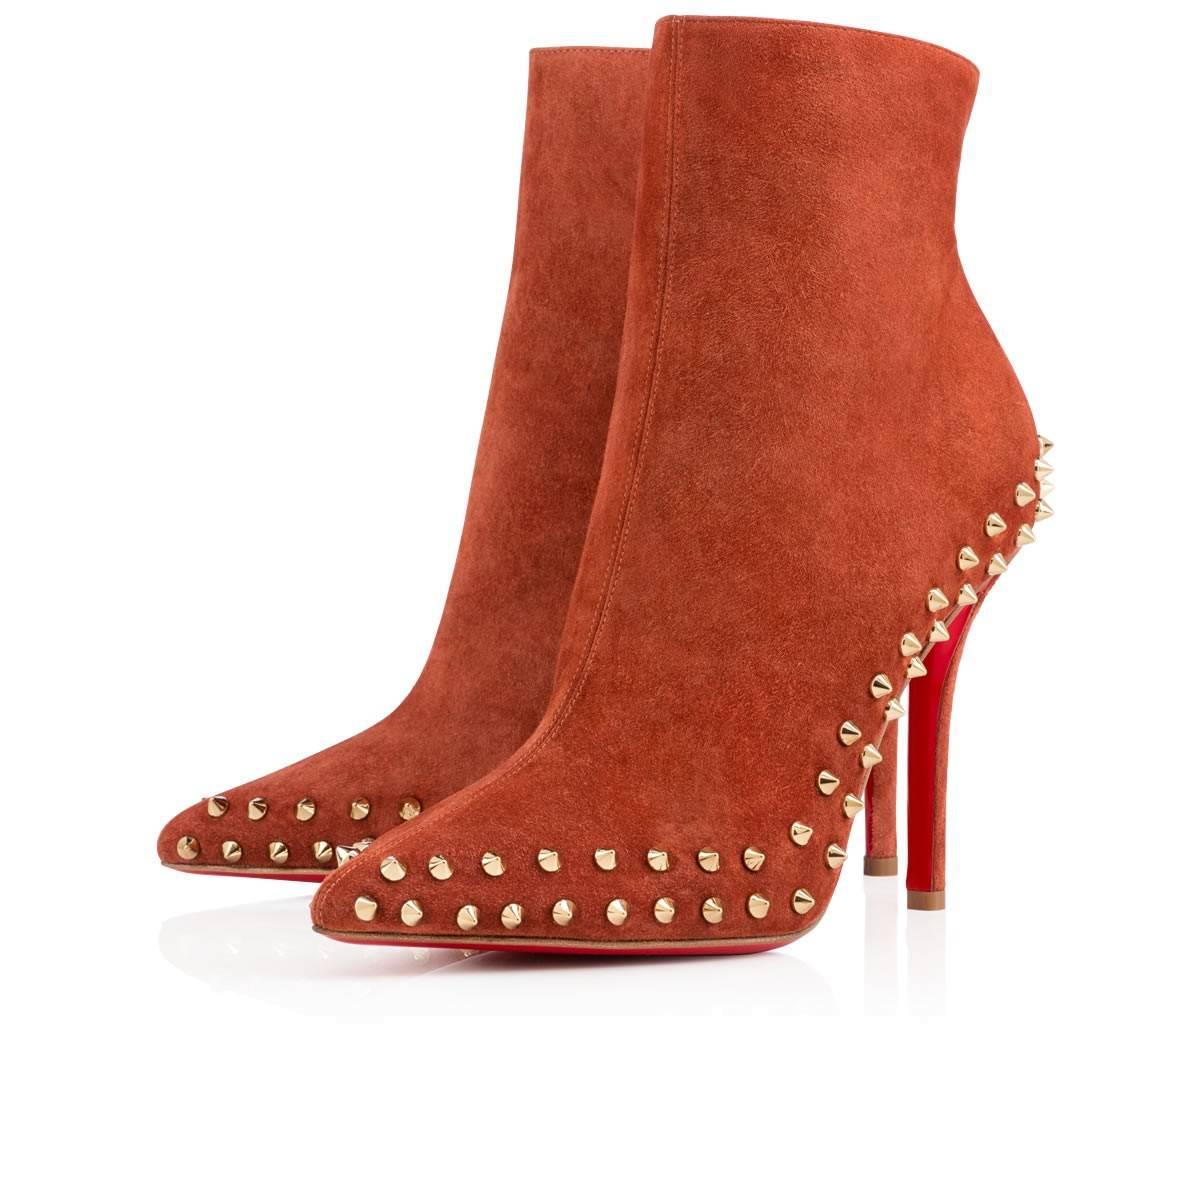 Christian Louboutin - Boots(1095 €)